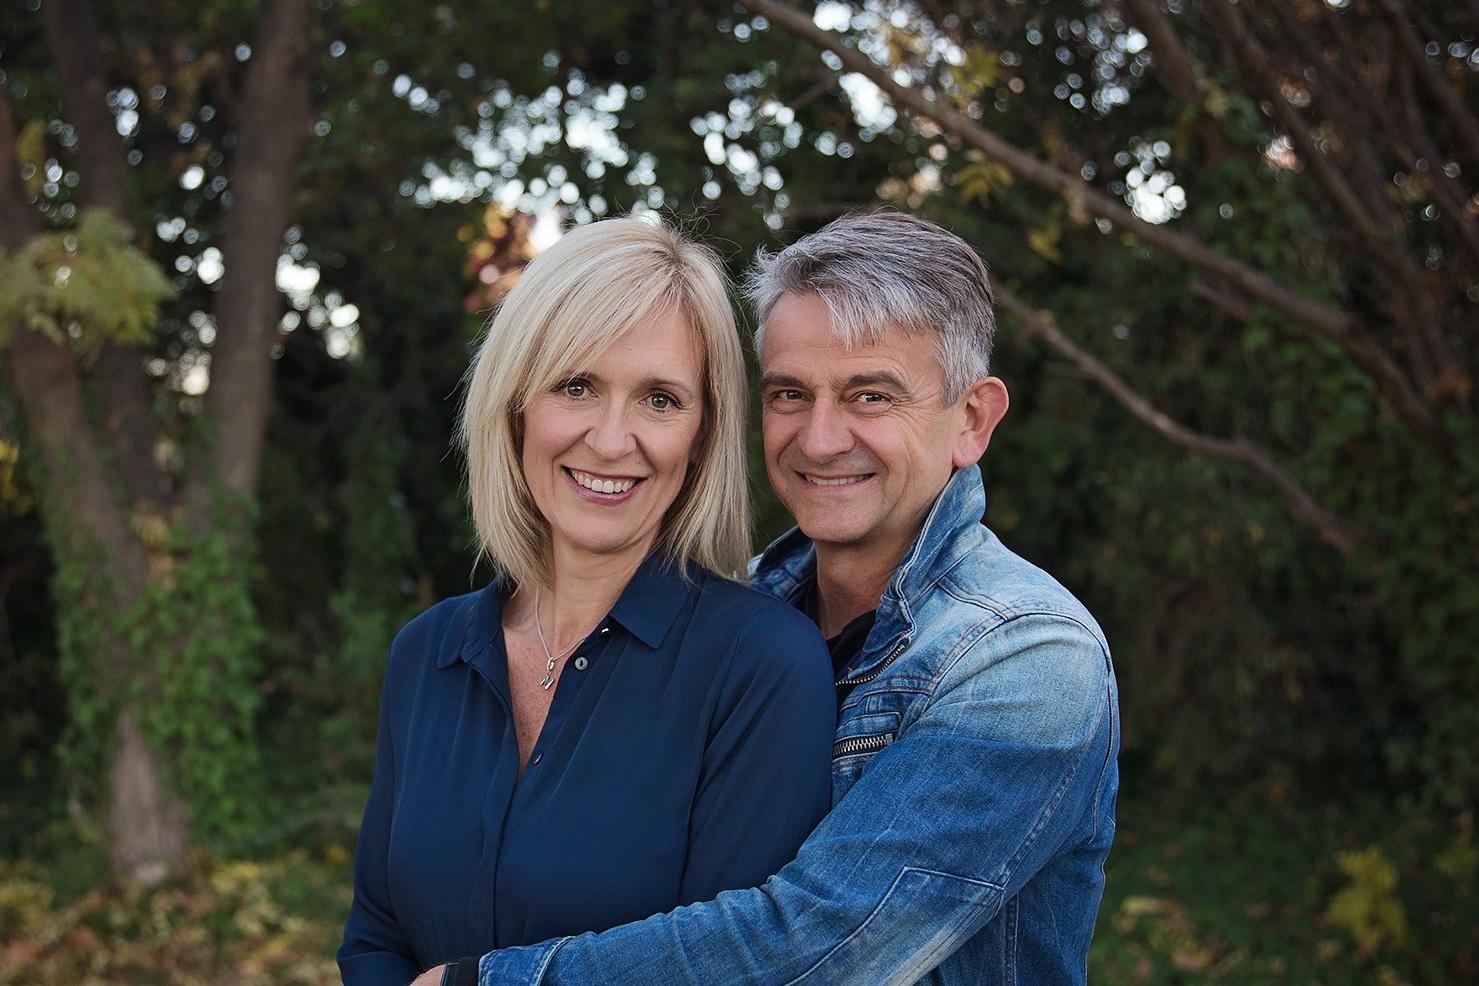 Pastors Melanie and Paul Marshall